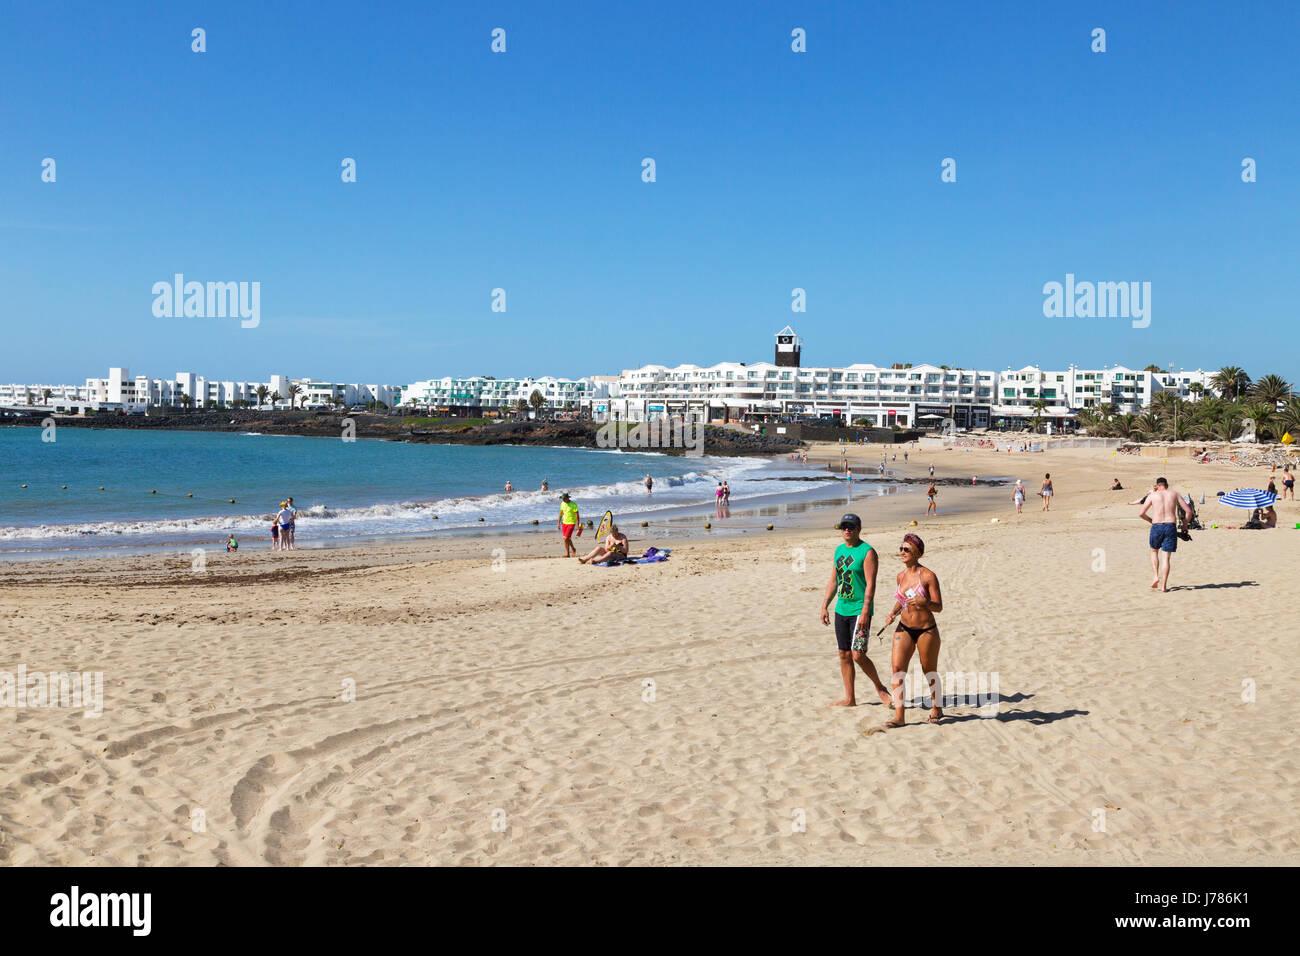 Lanzarote Strand, Playa Las Cucharas, Costa Teguise, Lanzarote, Kanarische Inseln-Europa Stockbild